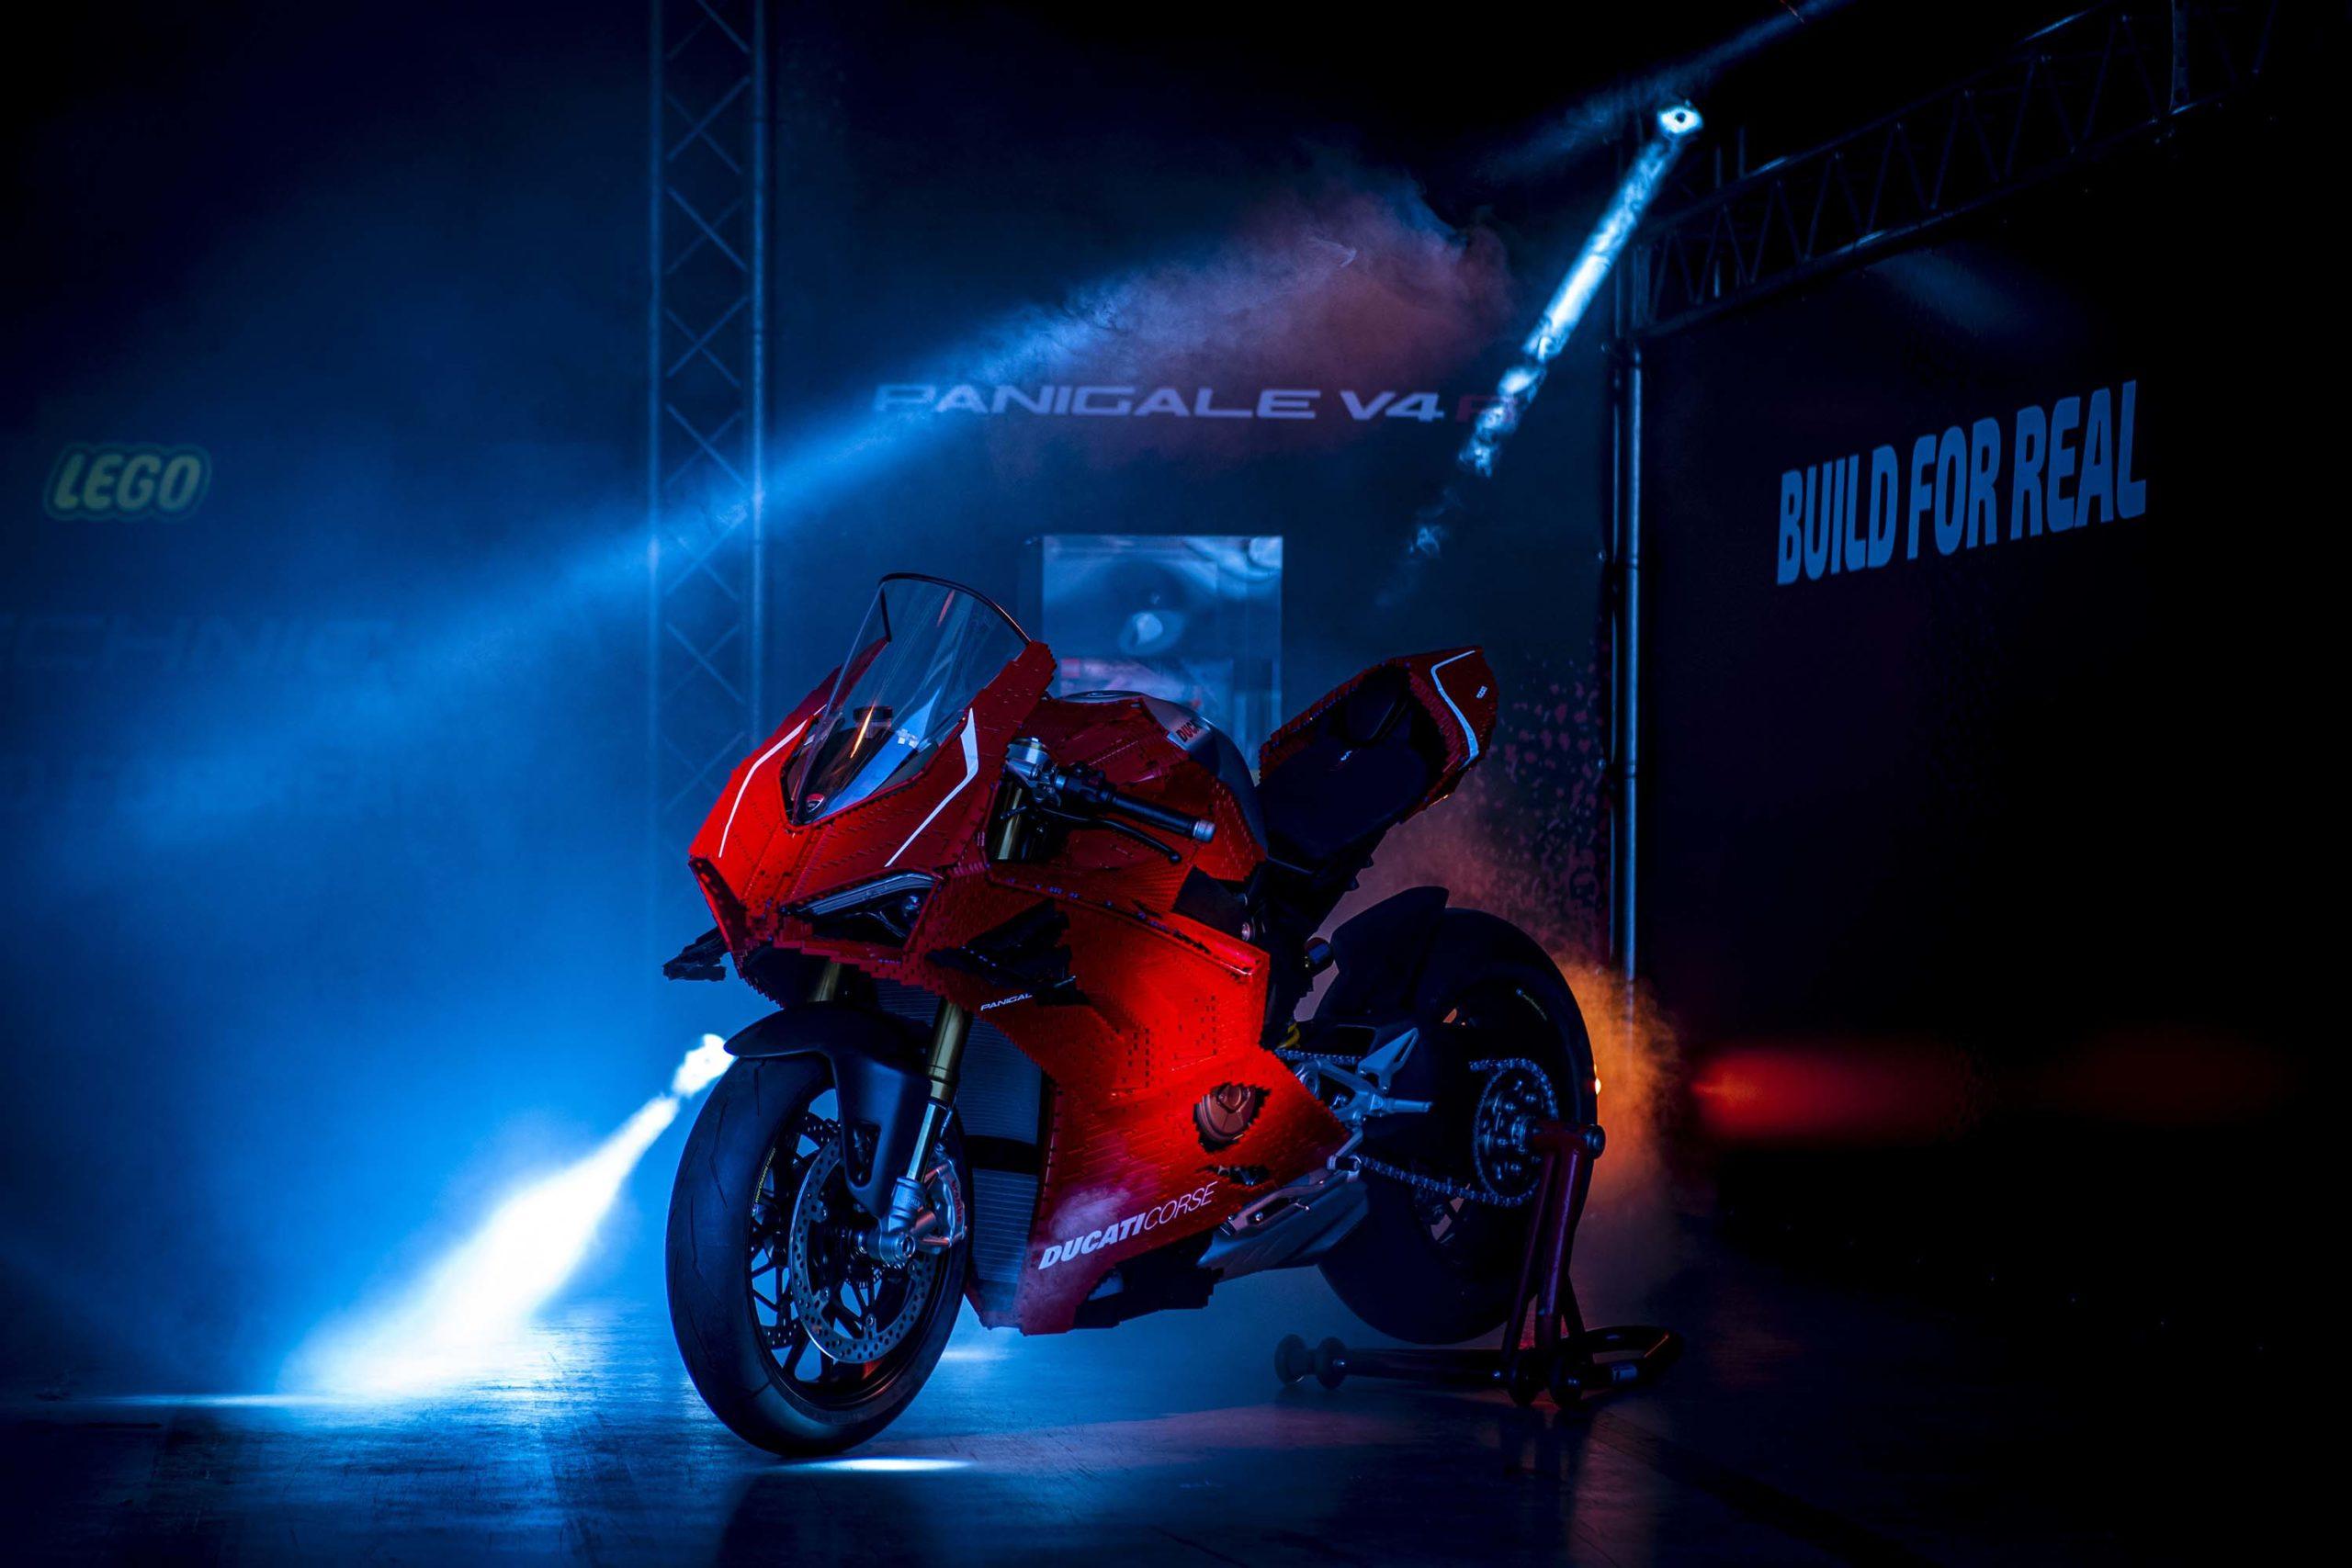 Ducati-Panigale-V4-R-lego-build-12